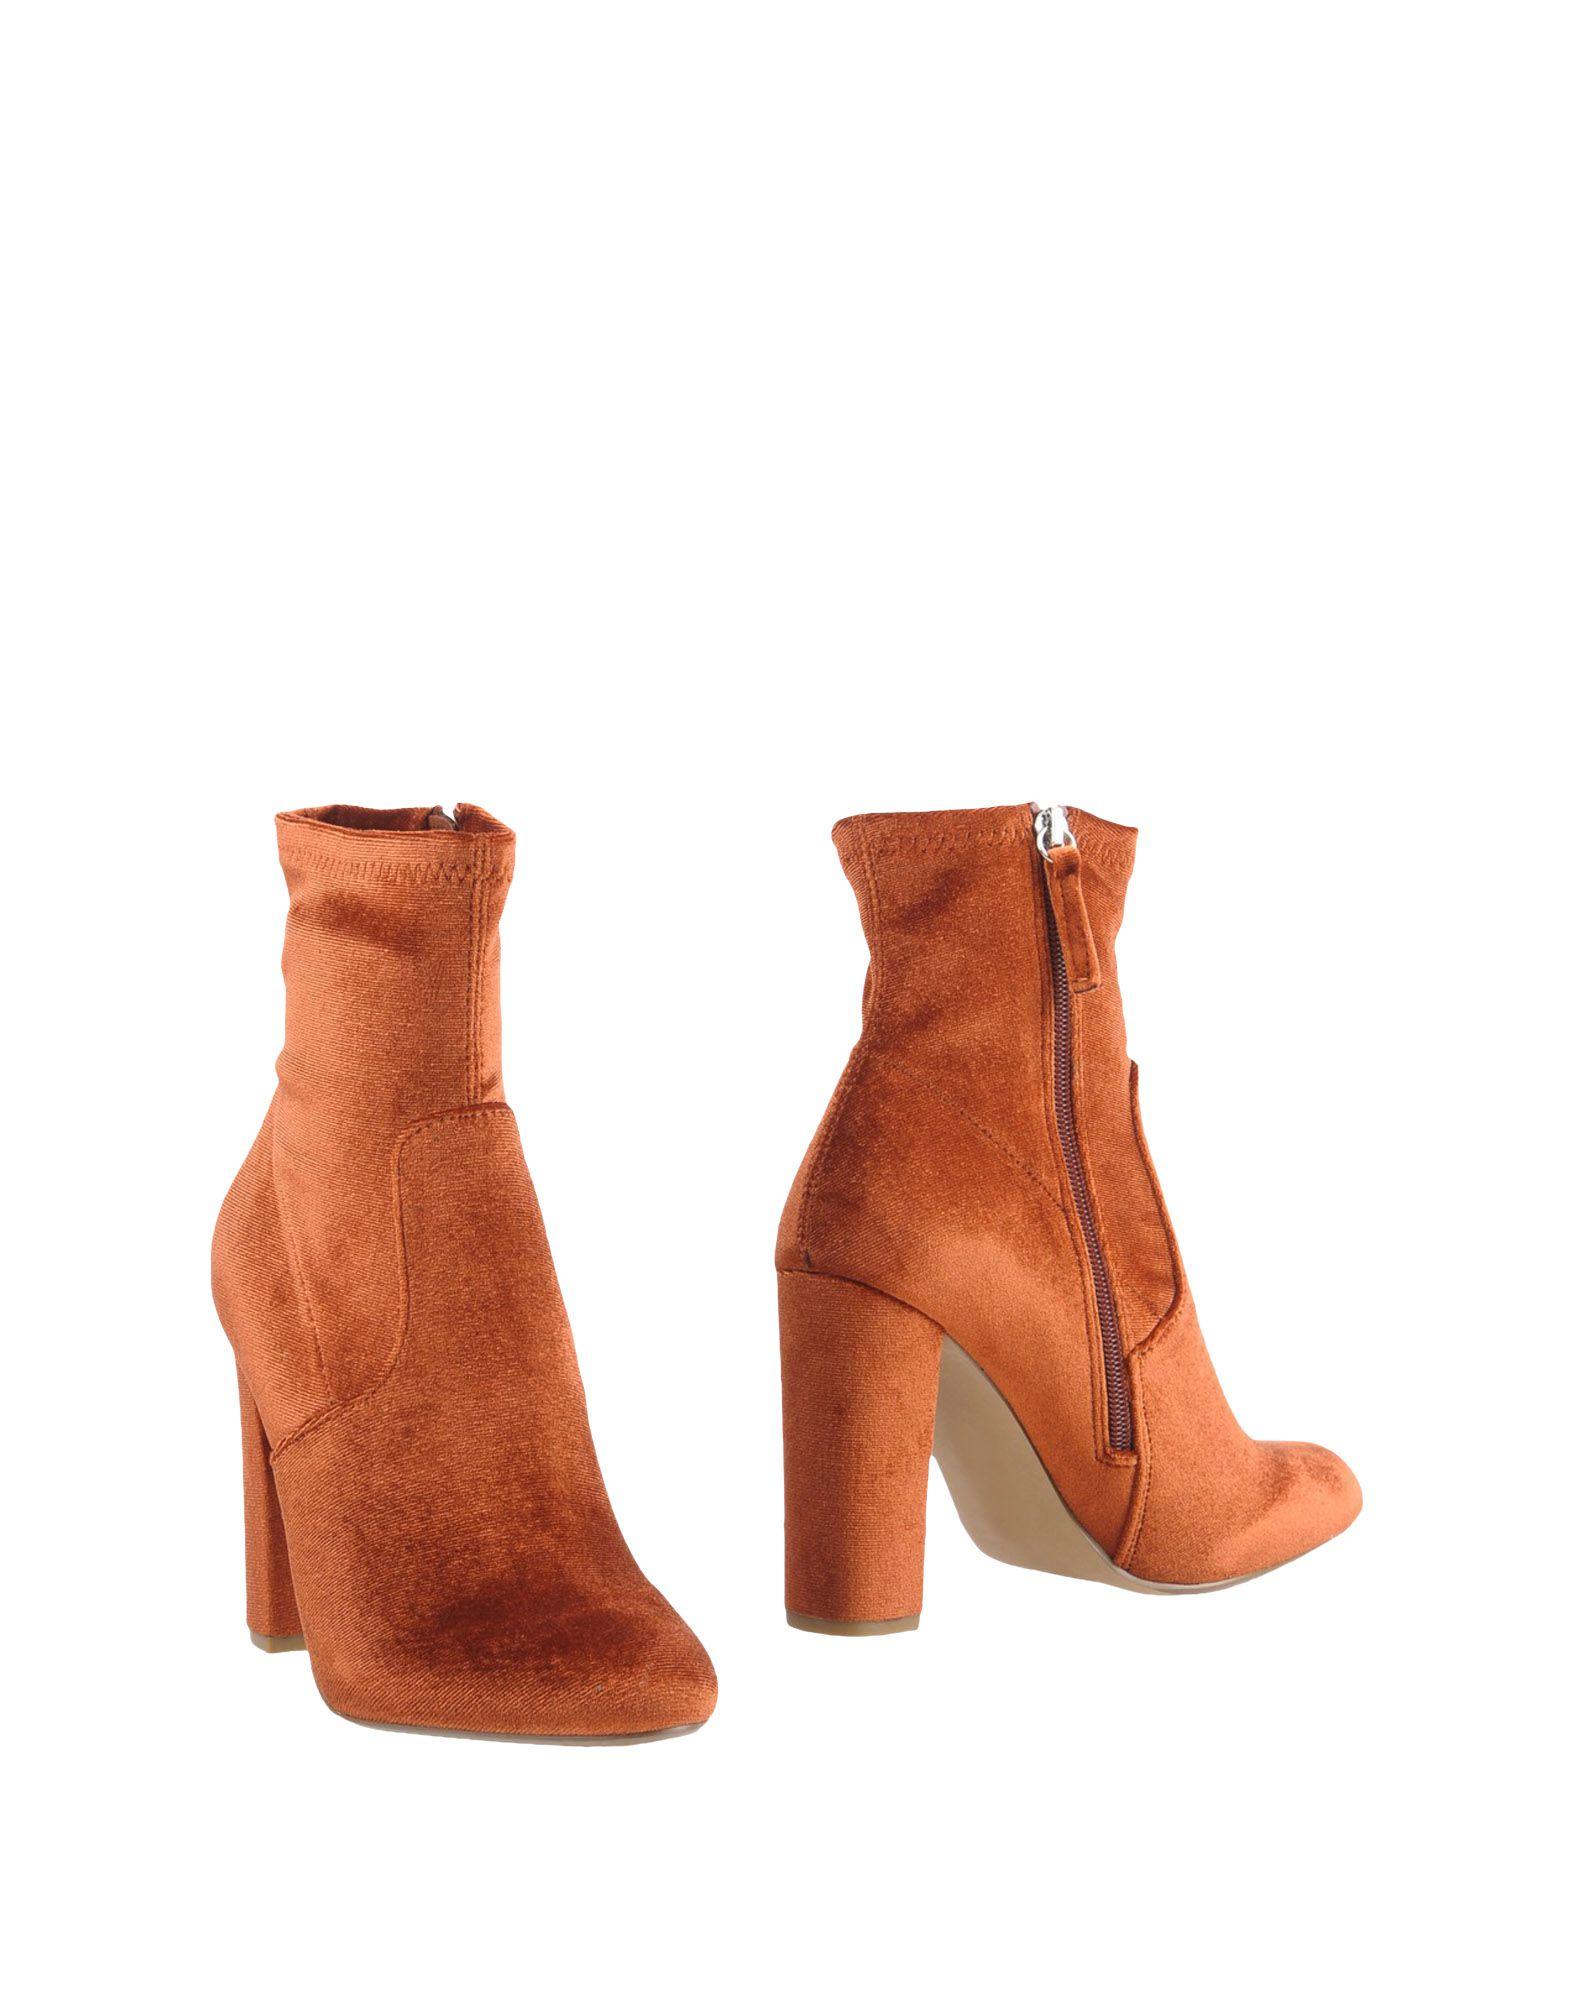 Steve Madden Stiefelette Damen  Gute 11317632XI Gute  Qualität beliebte Schuhe ffaddc